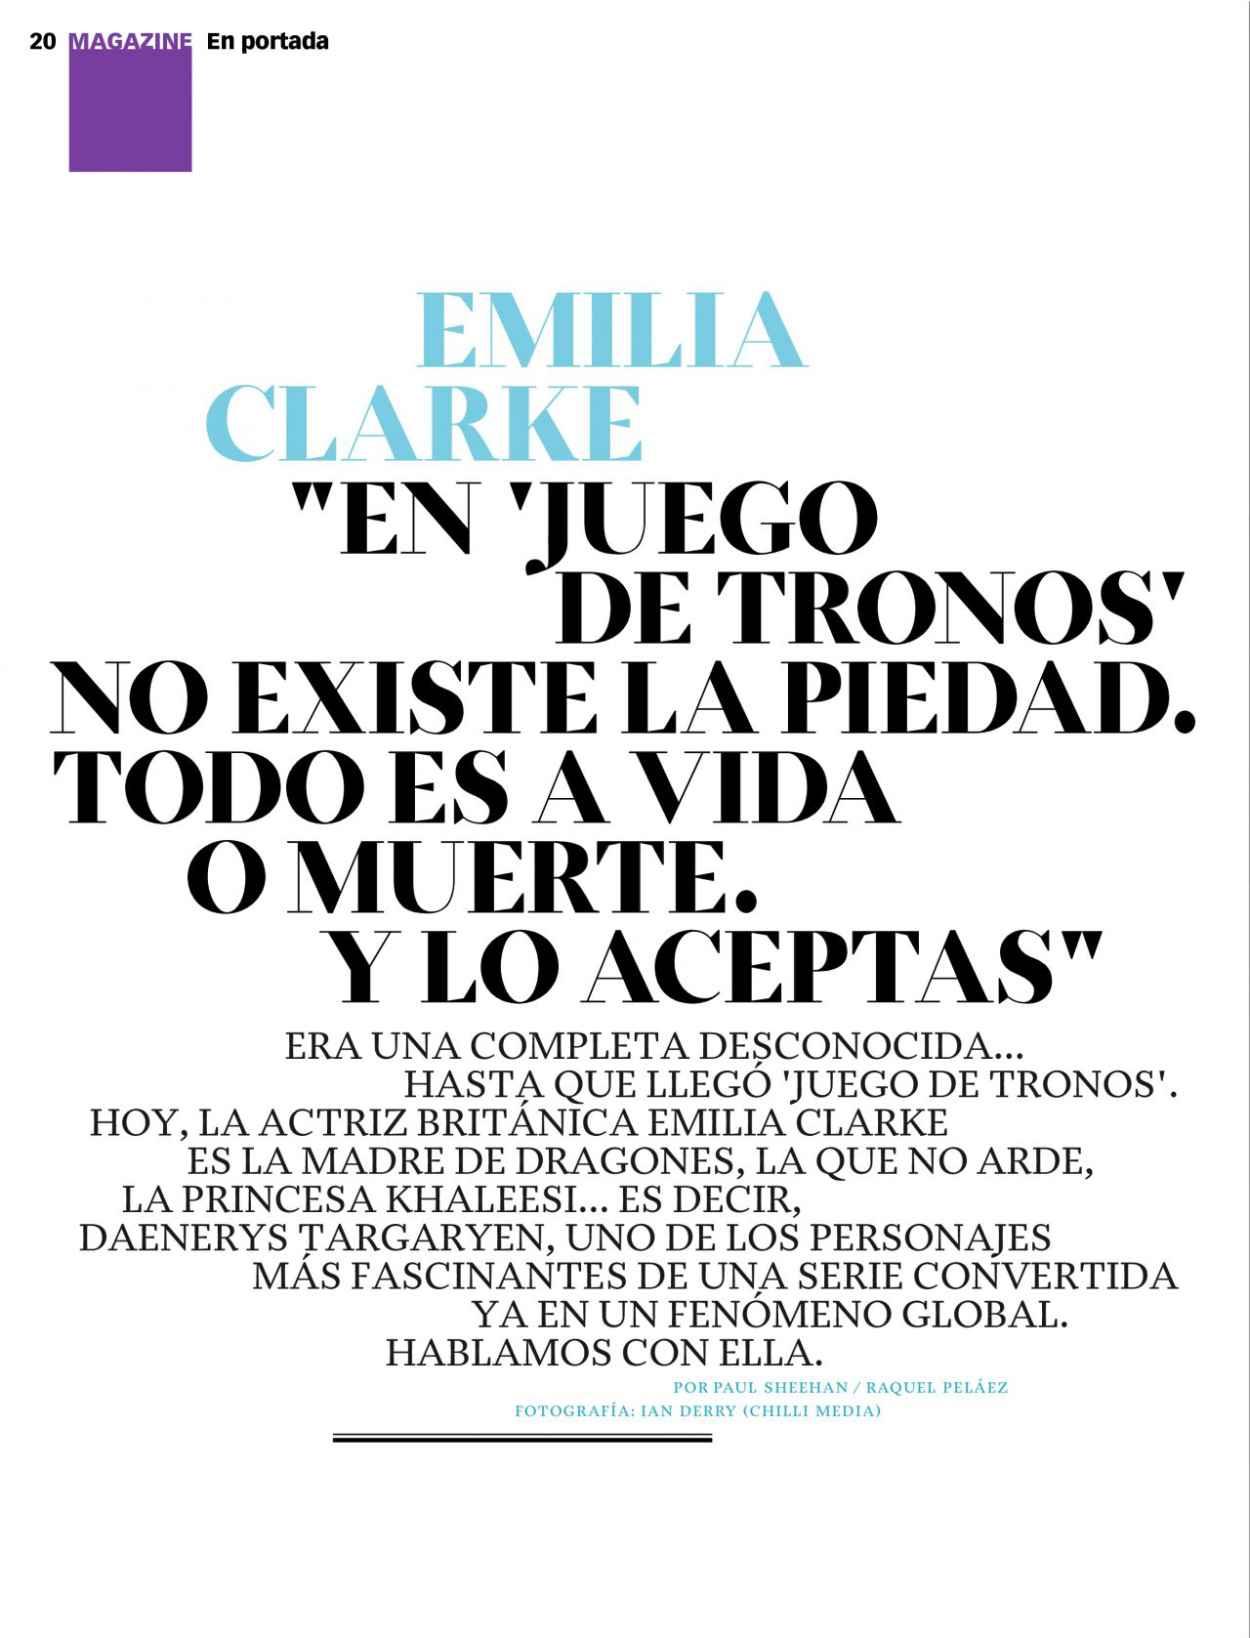 Emilia Clarke - Xl Semanal Magazine April 2015 Issue-3